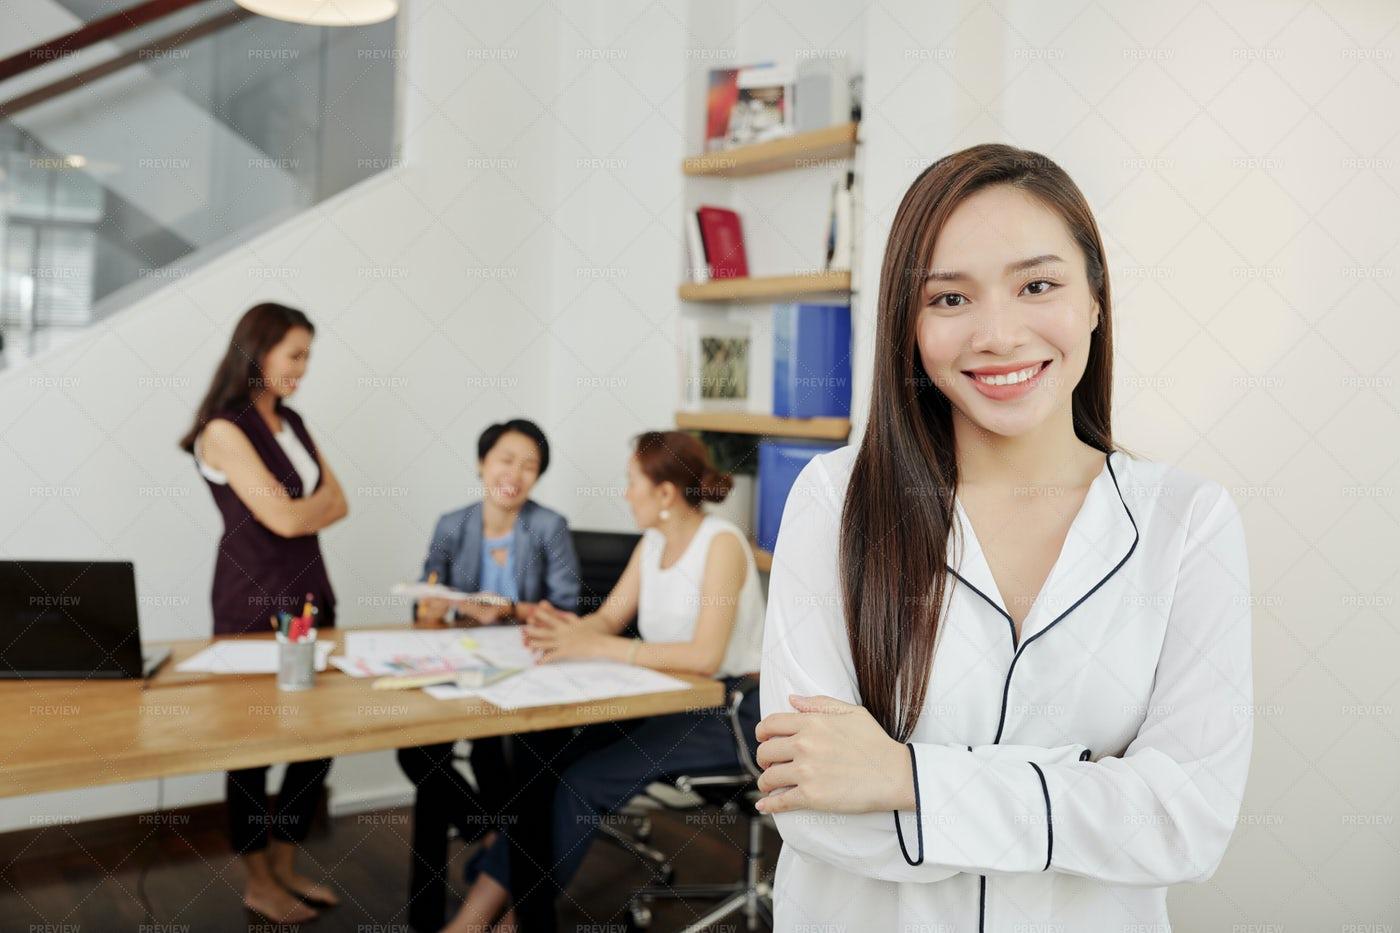 Business Lady Folding Arms: Stock Photos